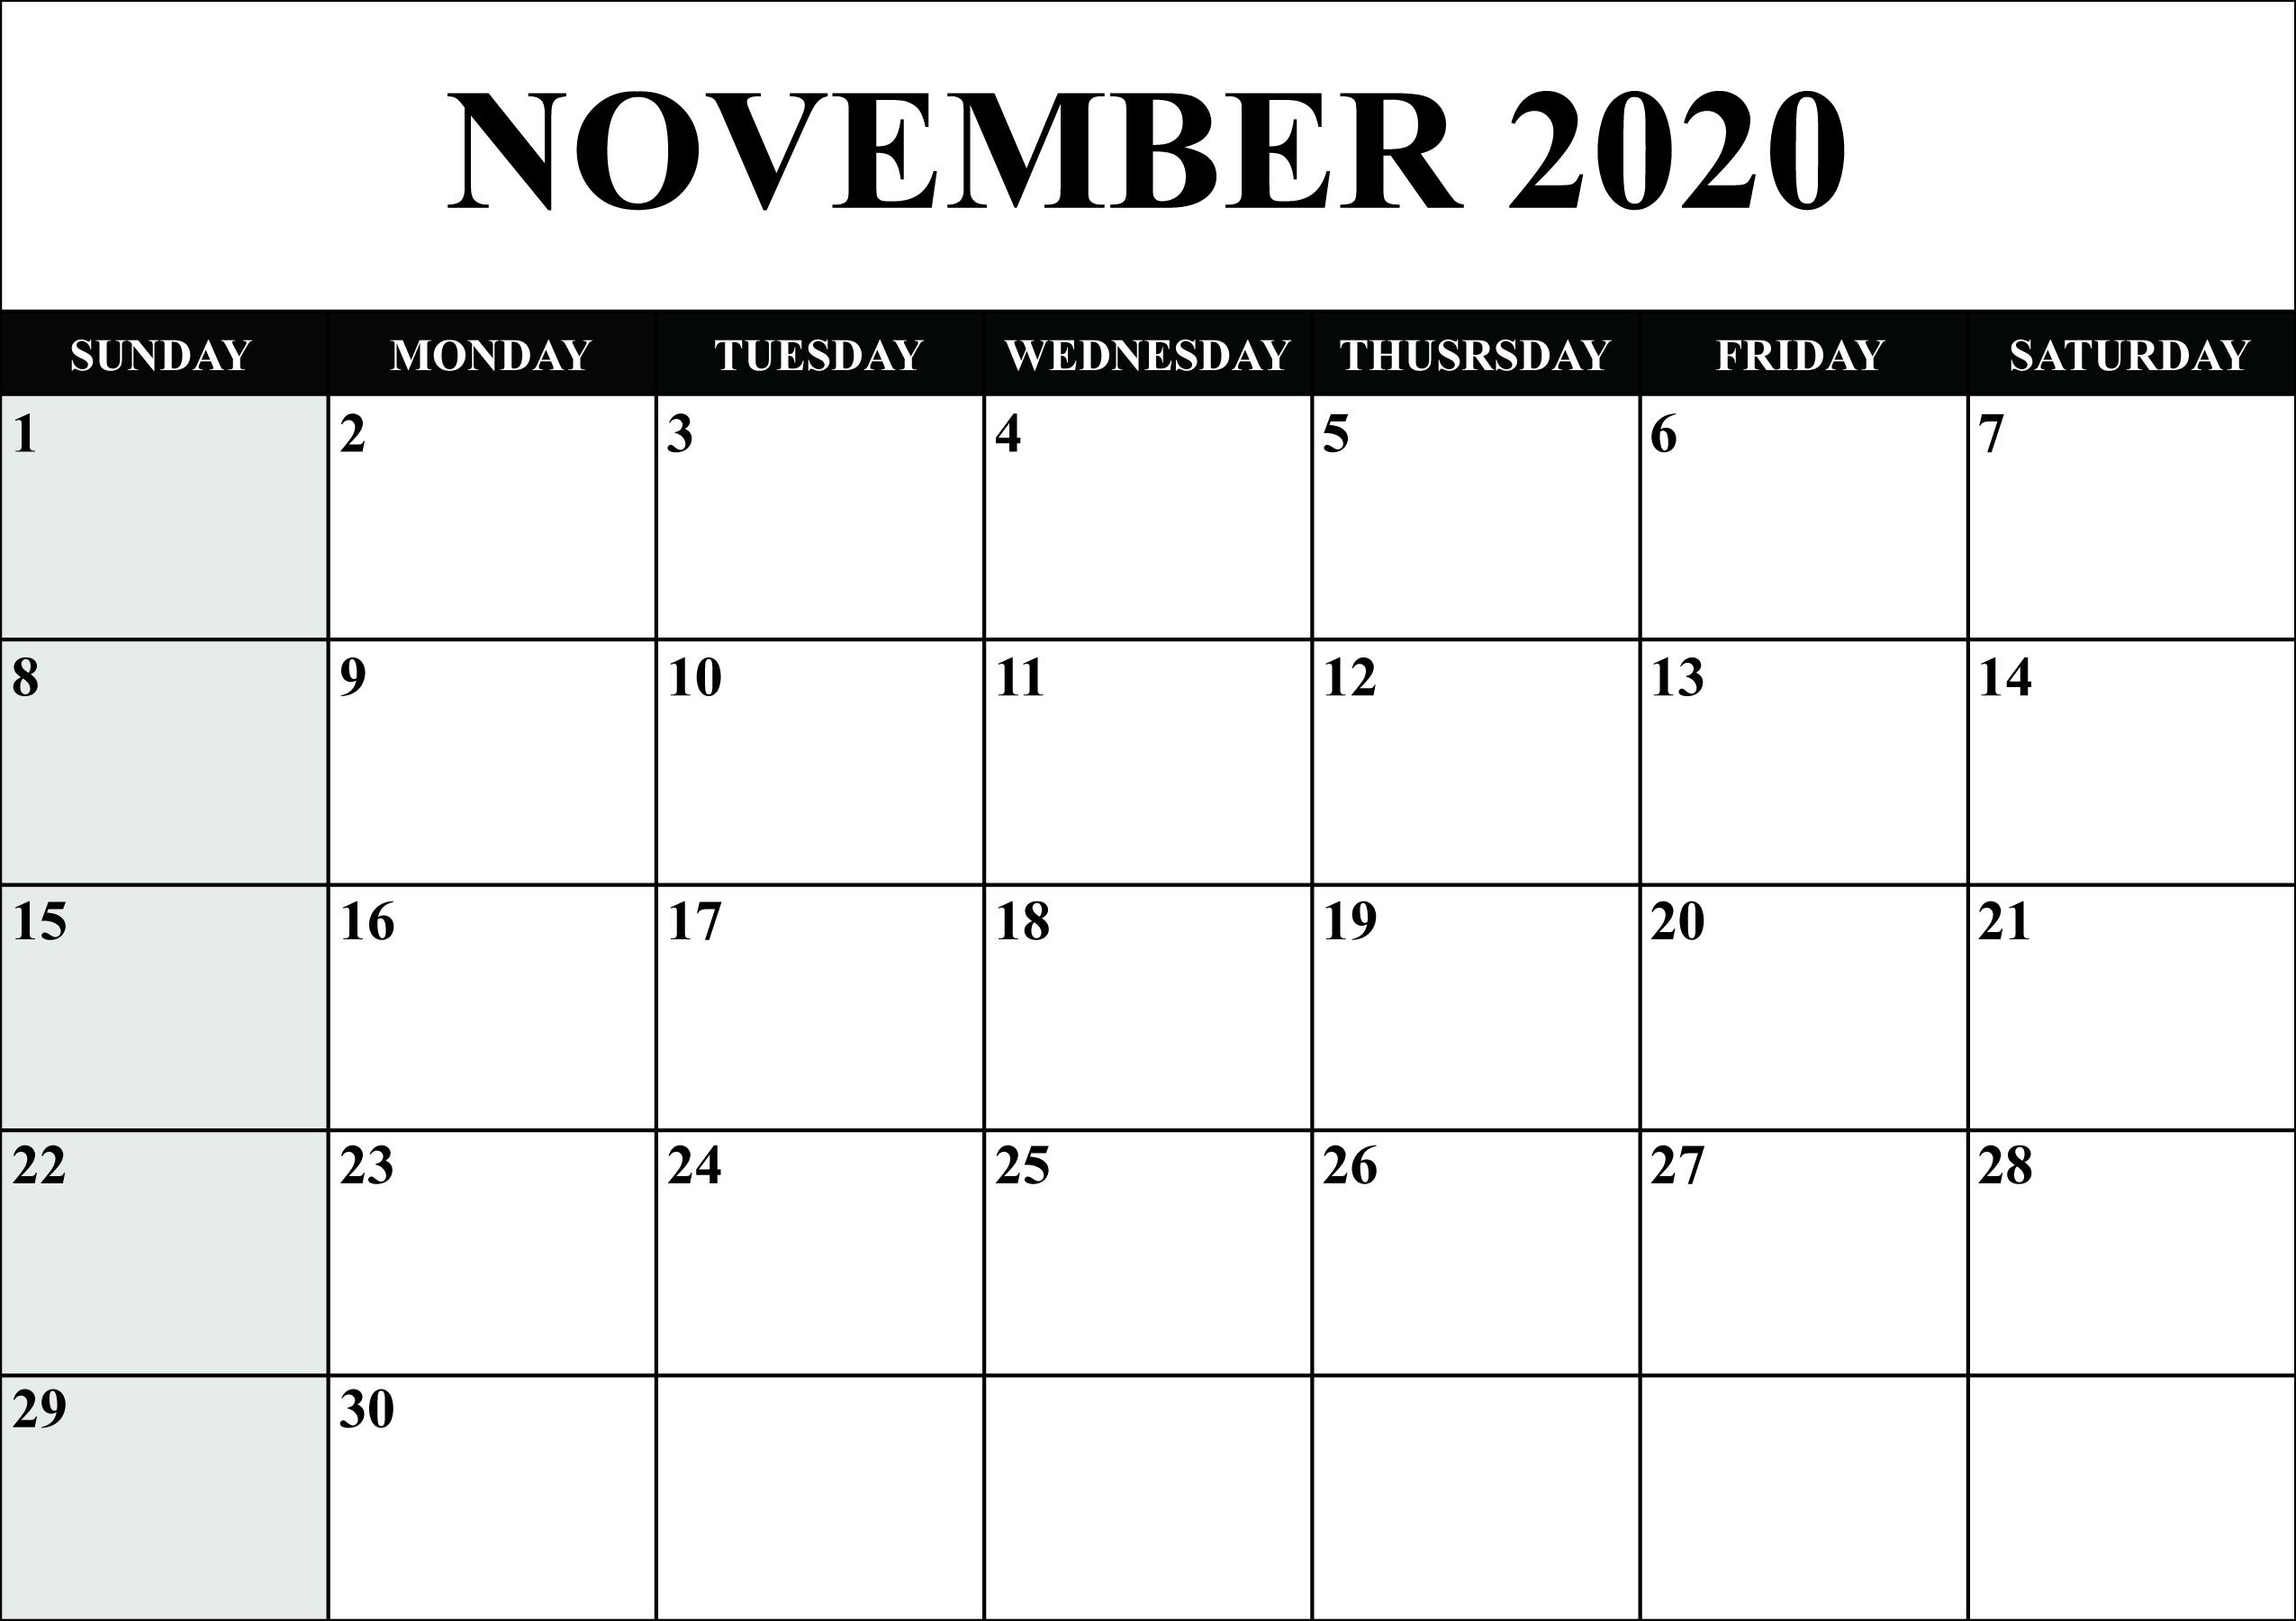 November 2020 Calendar Template Word, Pdf, Excel Format